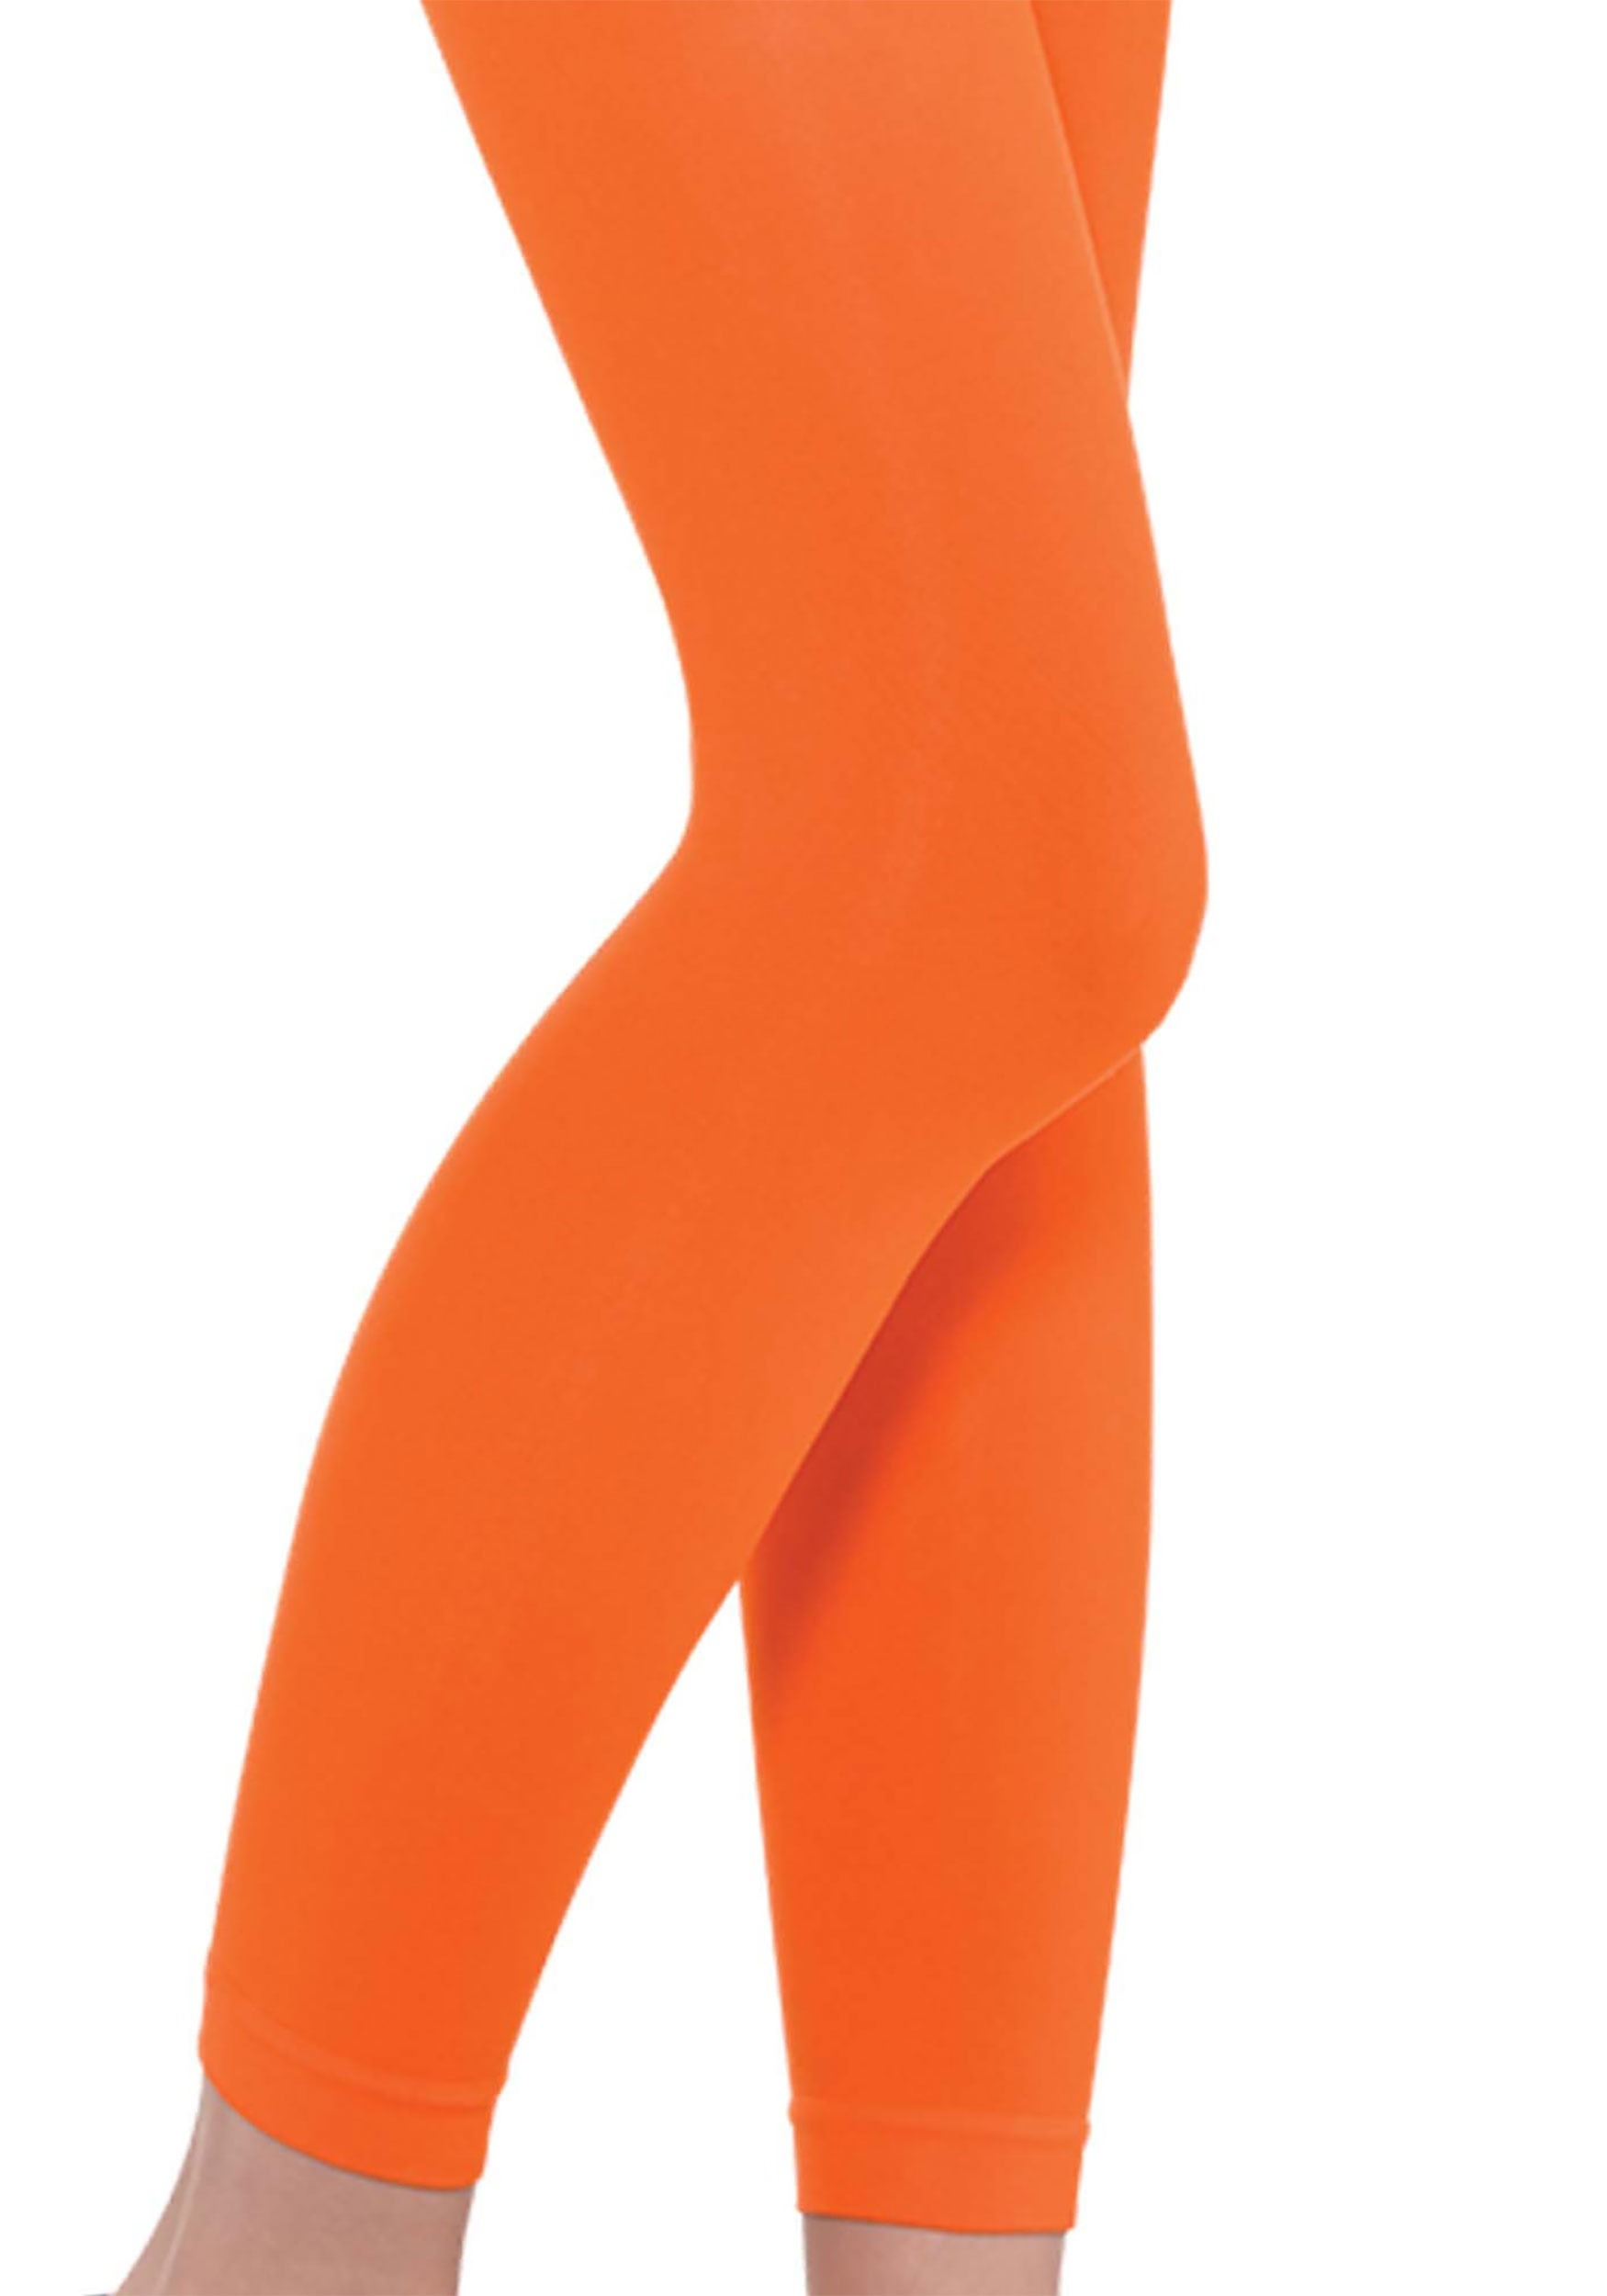 a923bc67bc3832 Orange Adult Footless Tights